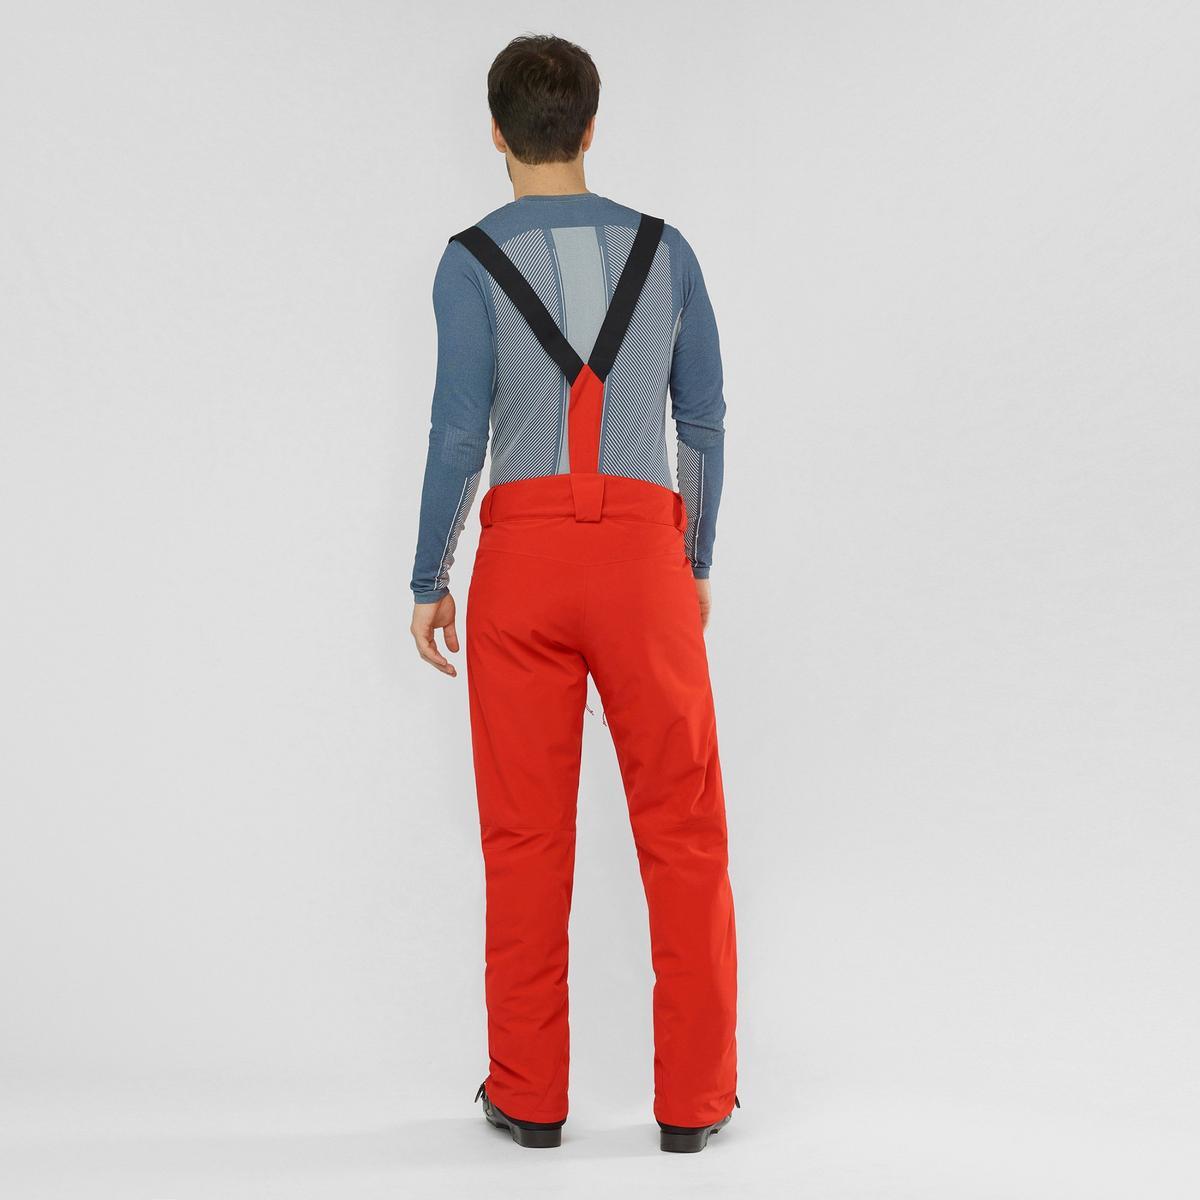 Salomon Men's Salomon Stance Pant - Red